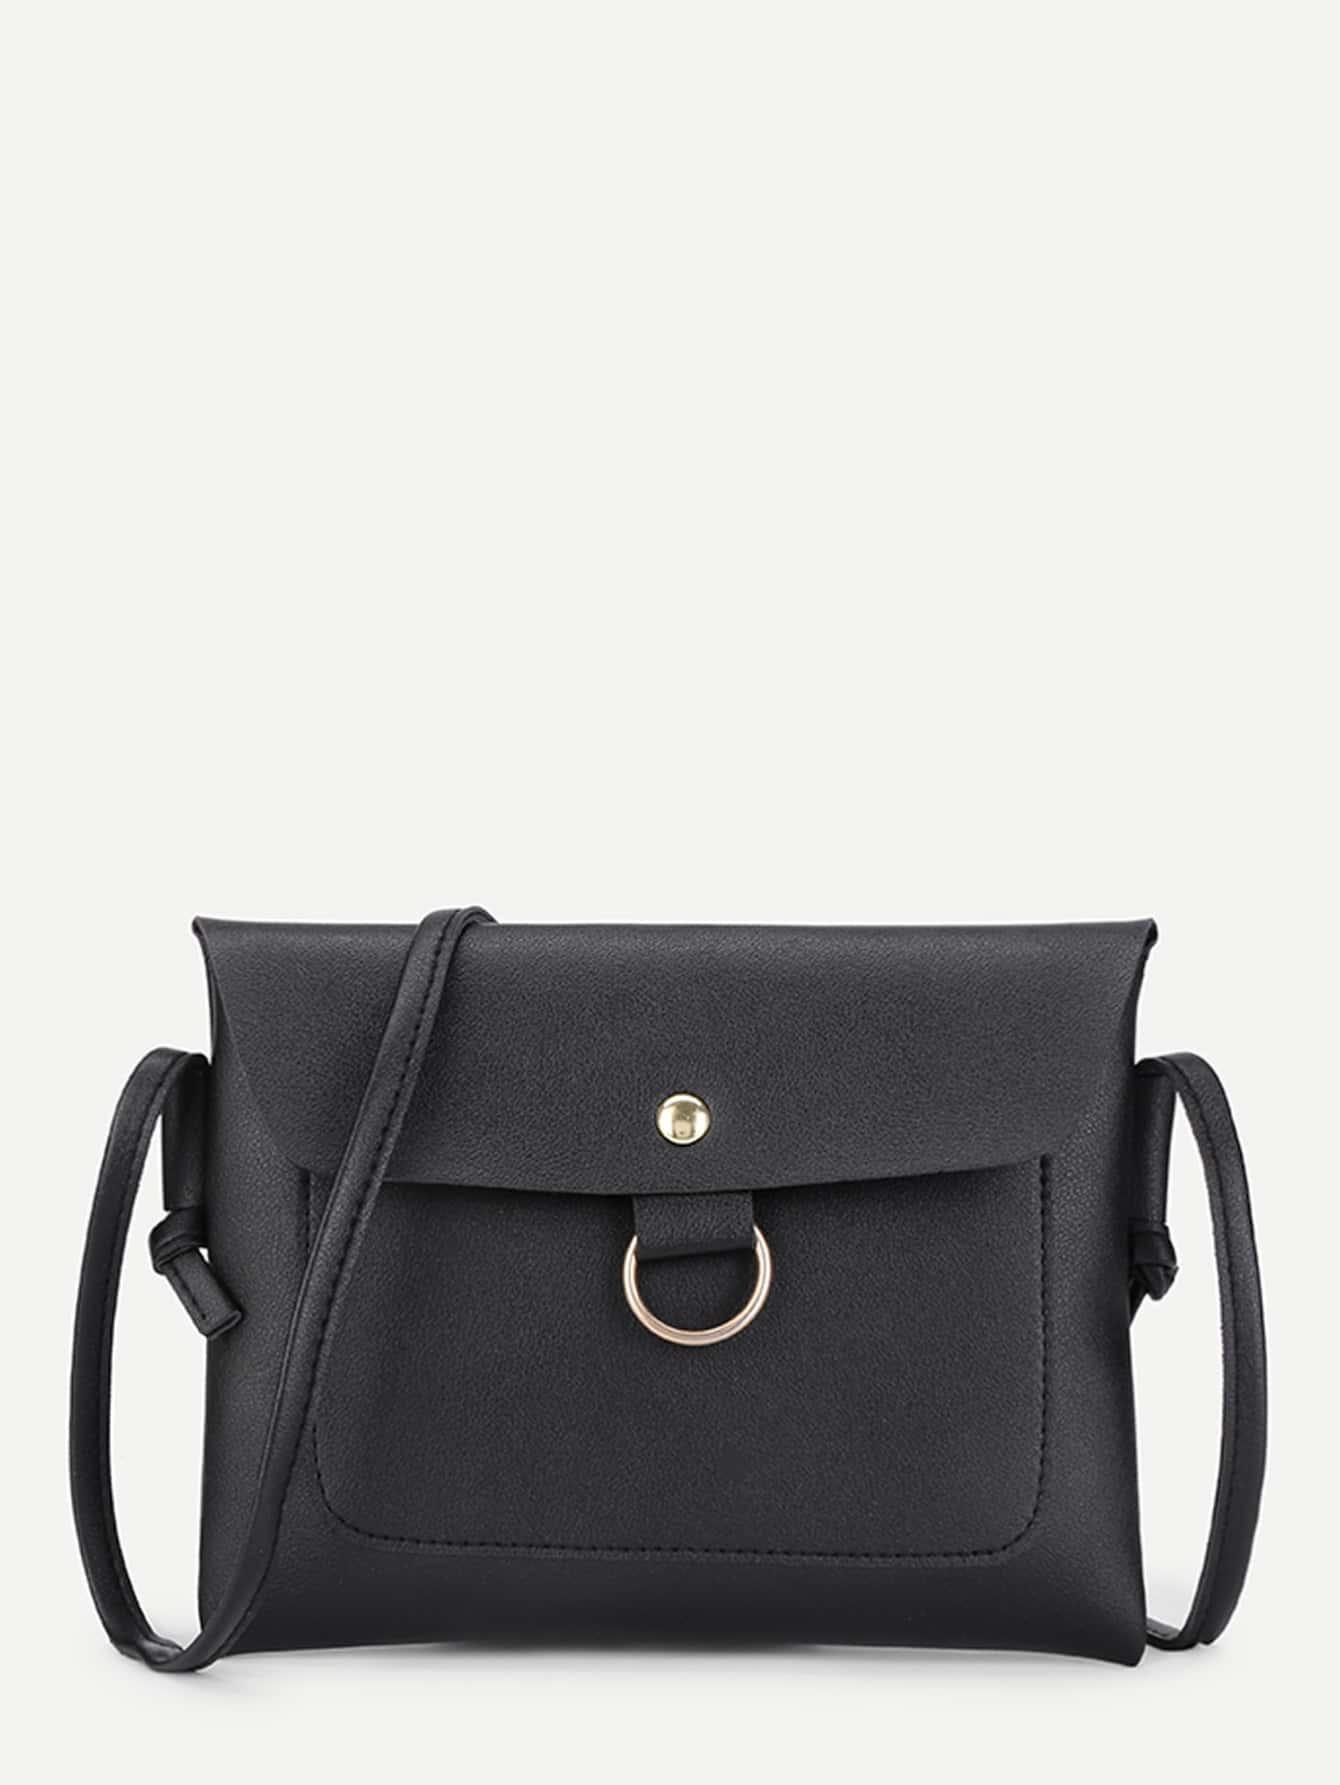 O Ring Crossbody Bag With Knot Strap 120cm 47 bronze twist o ring bag chain diy metal purse strap 20pcs freeshipping